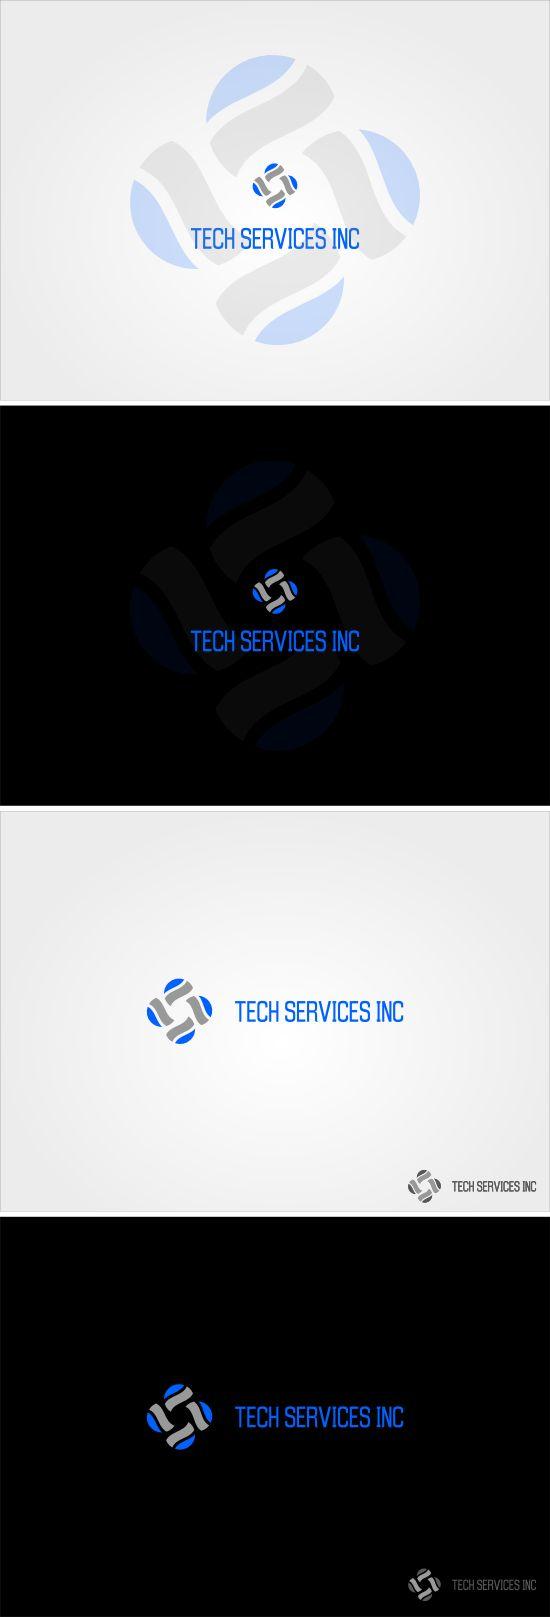 Tech Services Inc by Risman Widiantoro, via Behance